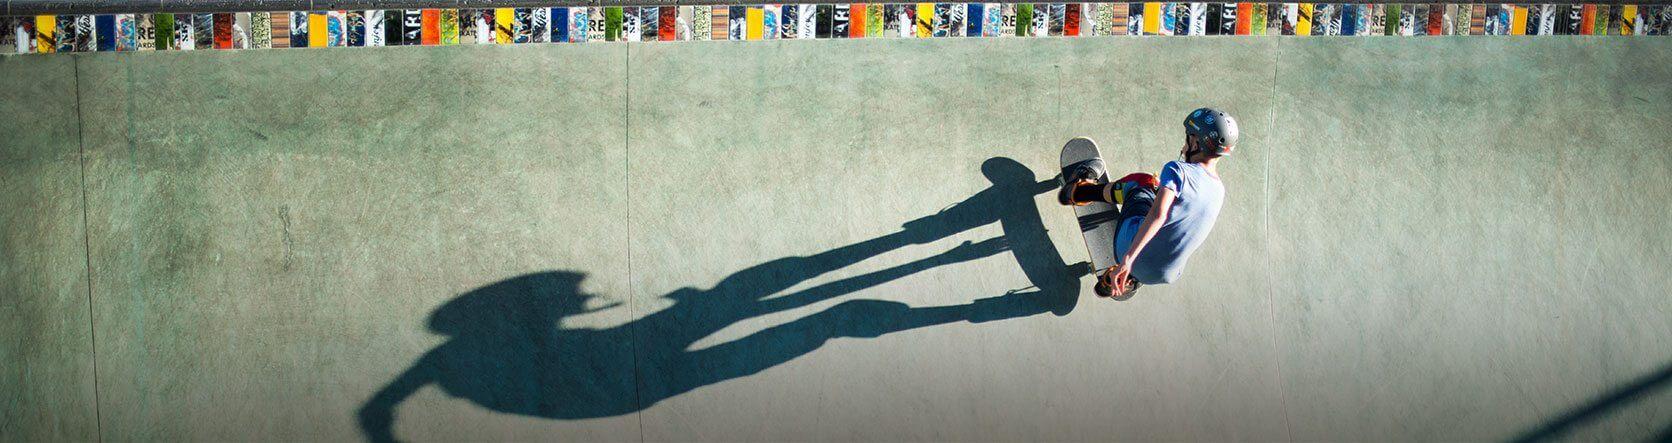 Boy skateboards at the San Luis Obispo Skate Park